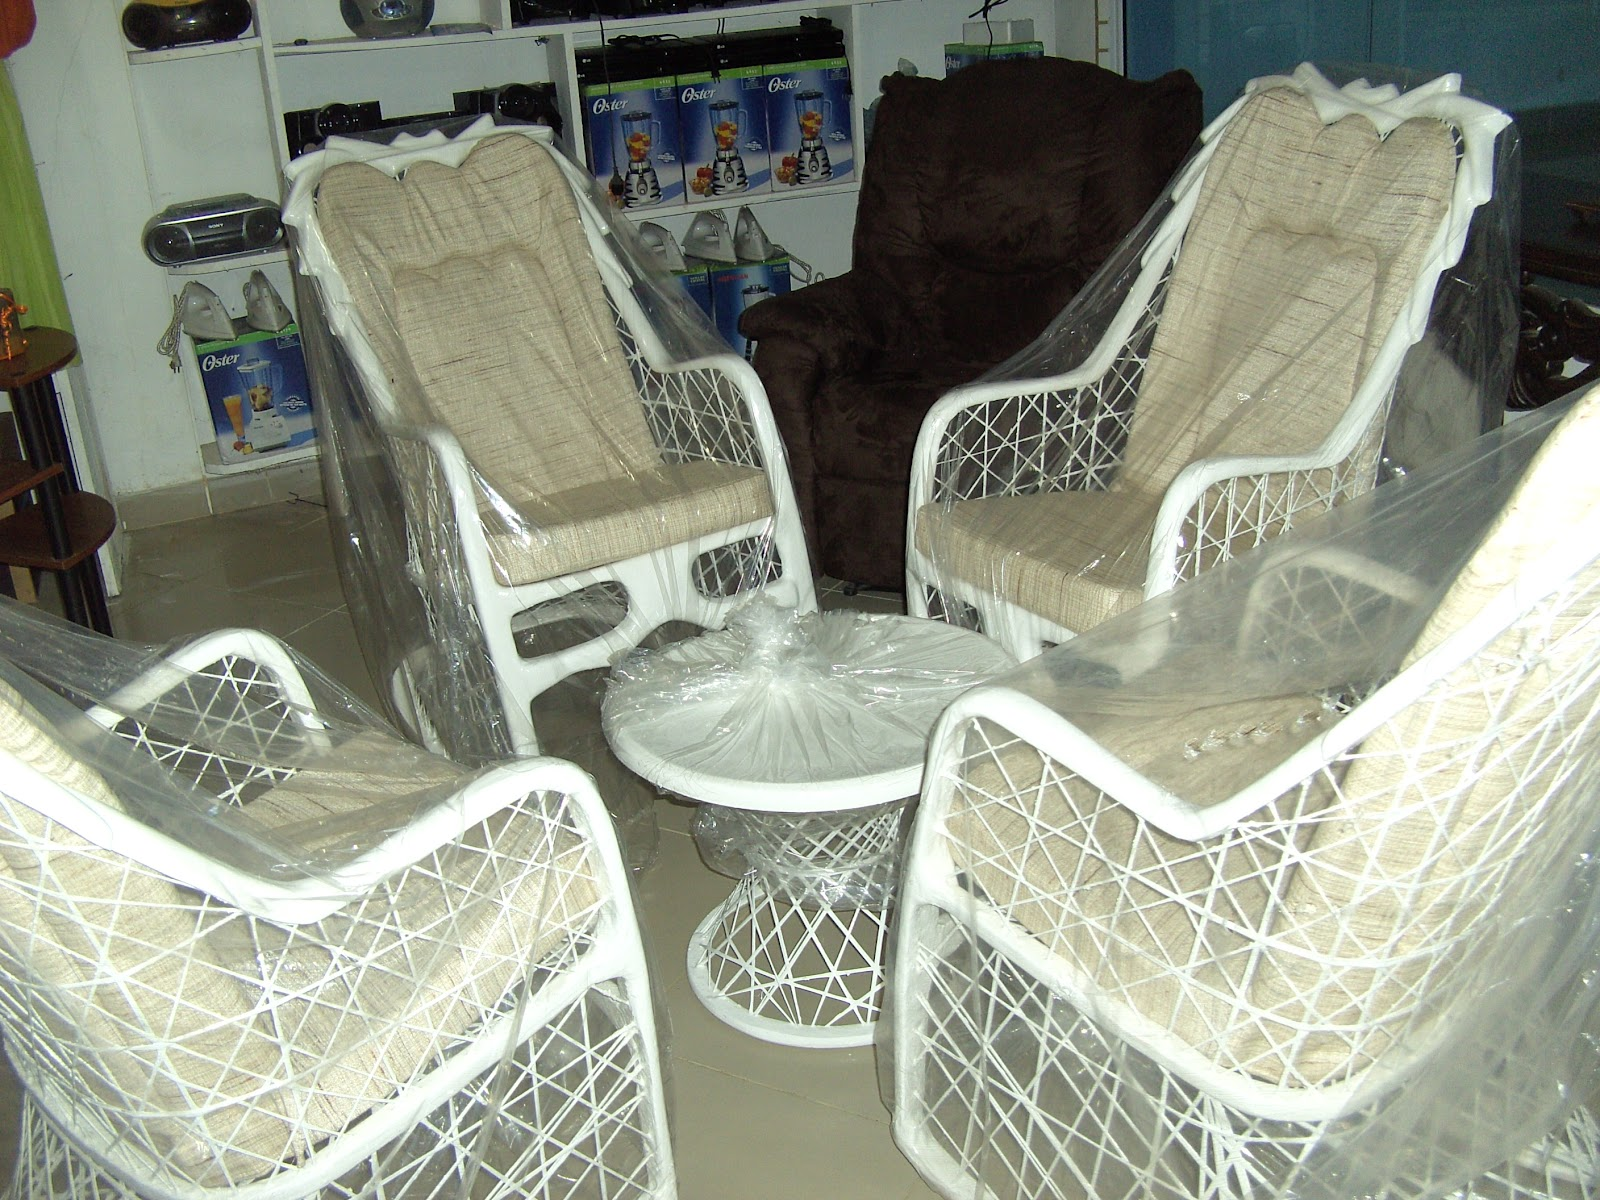 Plaza electromuebles delkis mecedoras en fibra de vidrio - Muebles de fibra de vidrio ...